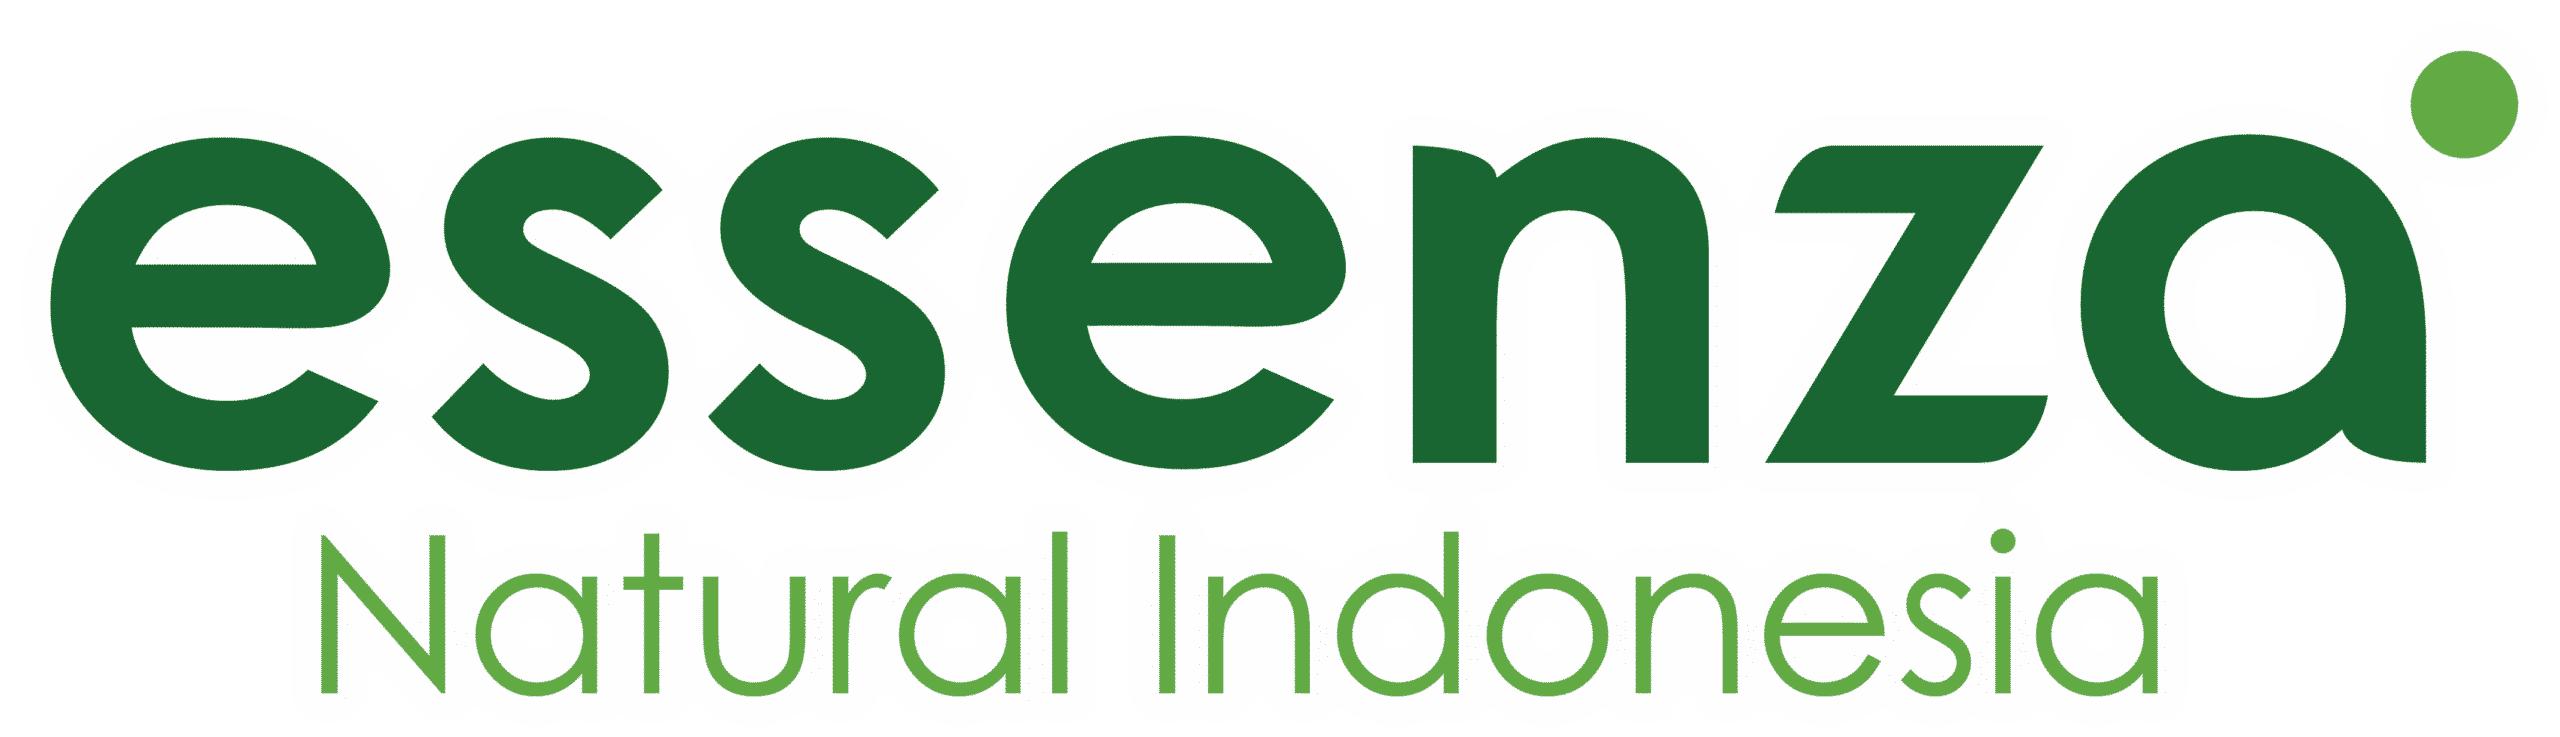 Essenza Natural Indonesia